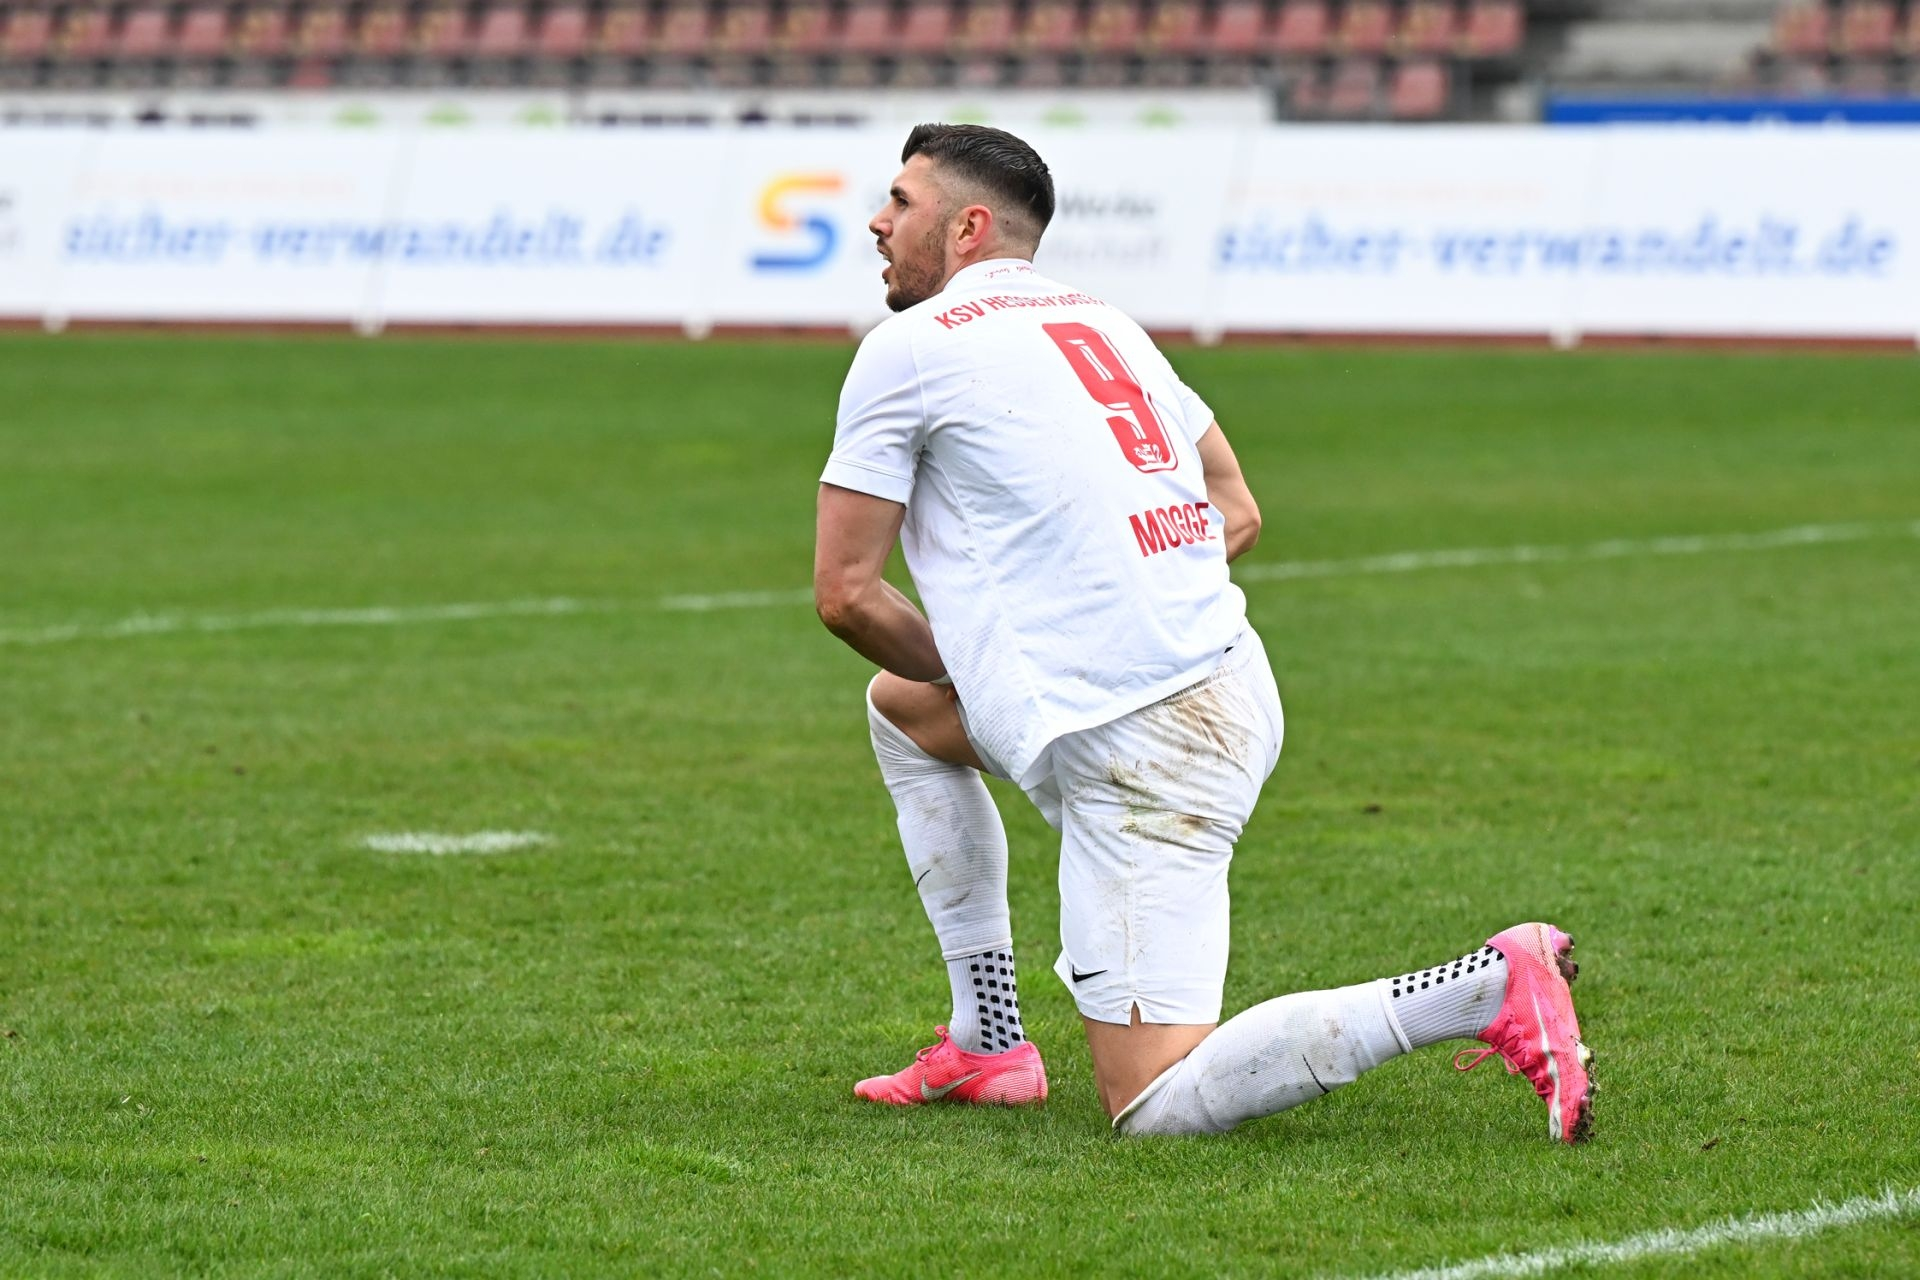 Regionalliga Südwest 2020/21, KSV Hessen Kassel, VfR Aalen, Endstand 1:1, Mogge